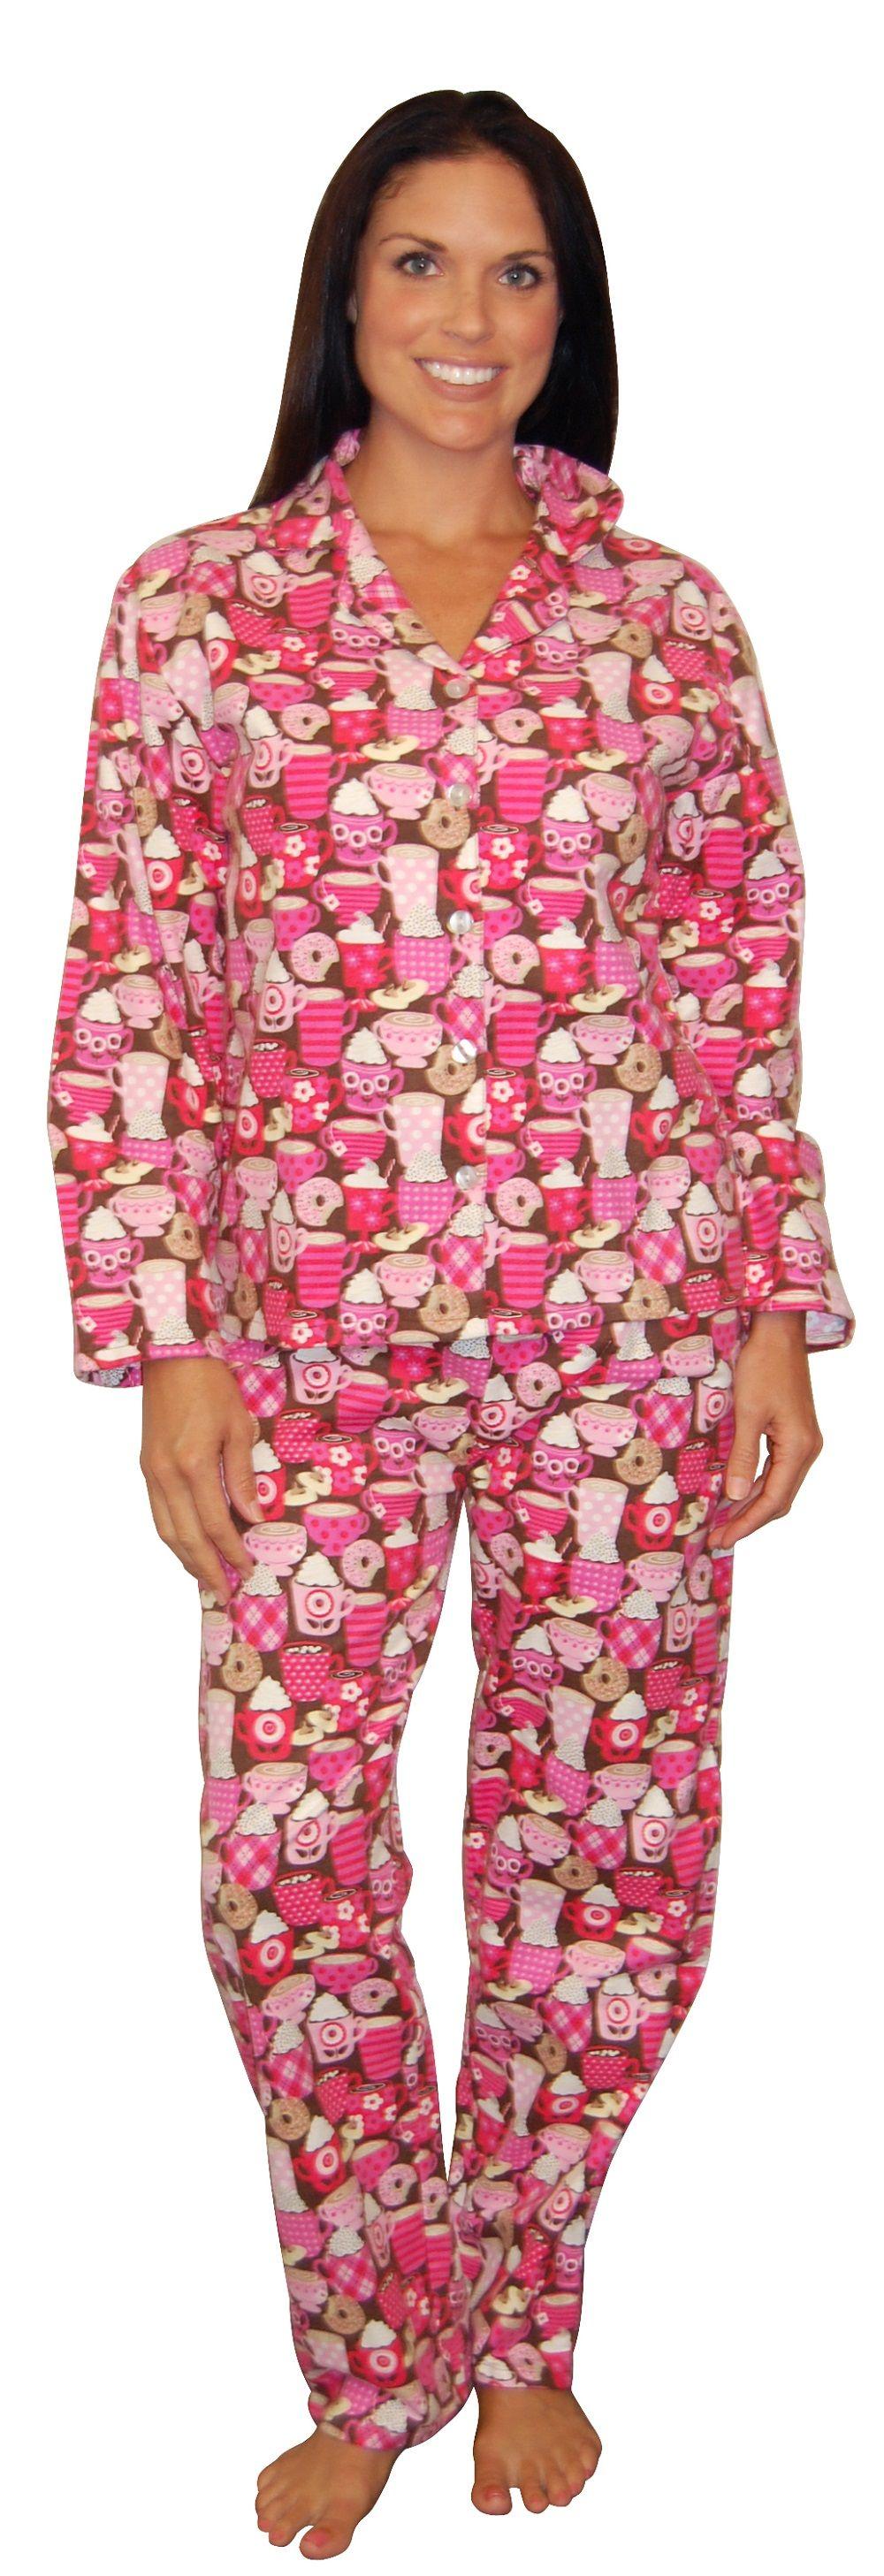 9f145747f944 PajamaMania Hot Chocolate Flannel Pajama